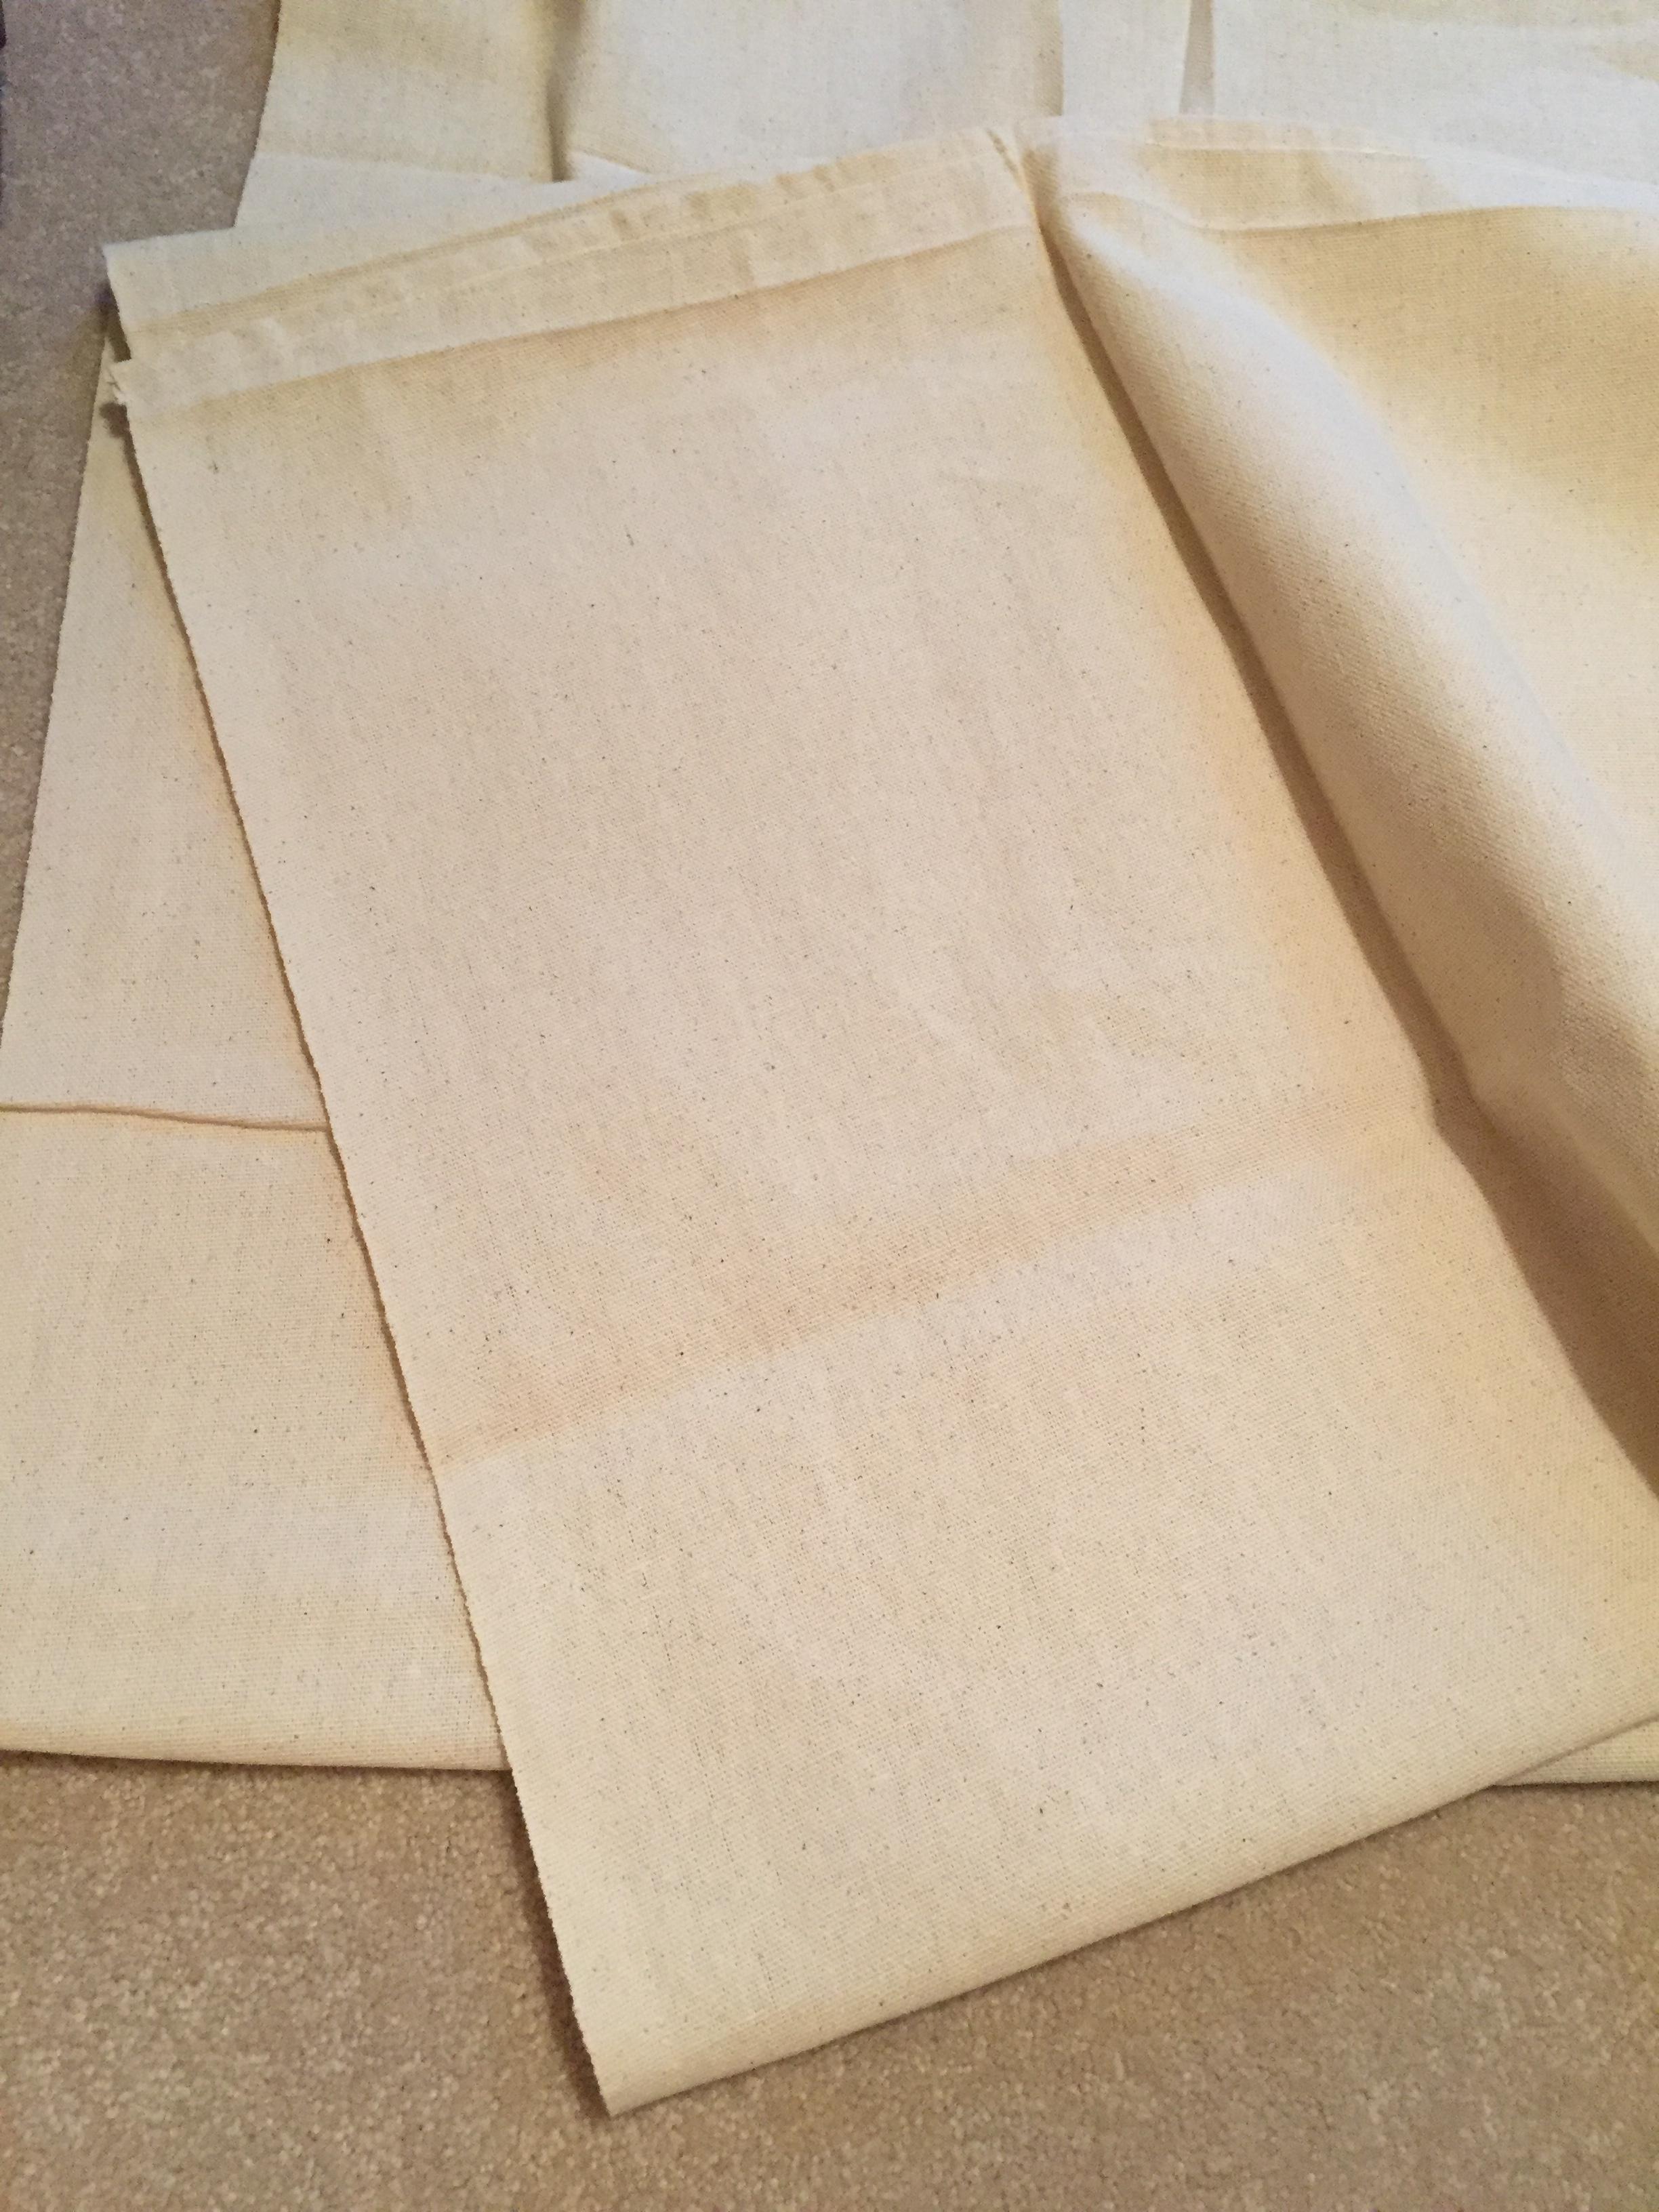 drop-cloth-fold.jpg